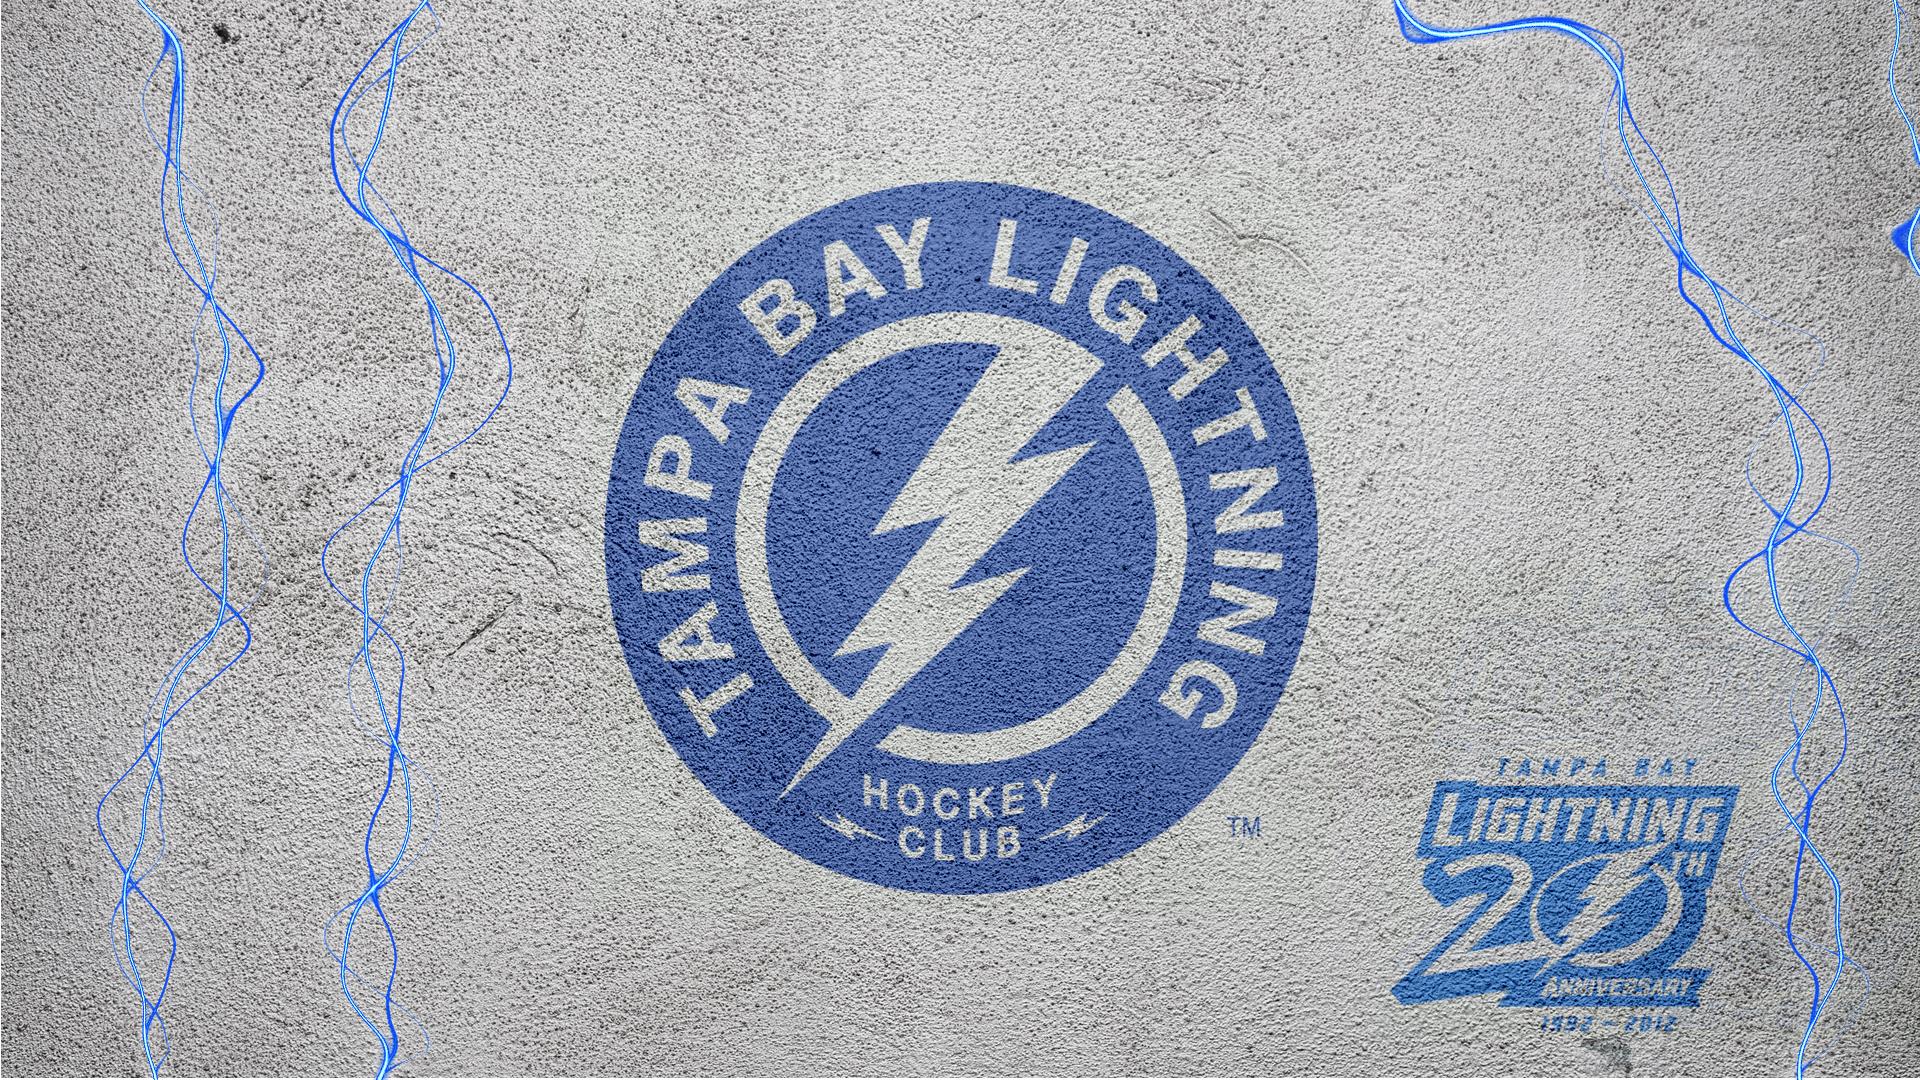 NHL Tampa Bay Lightning Shoulder Logo 2012 by Realyze 1920x1080